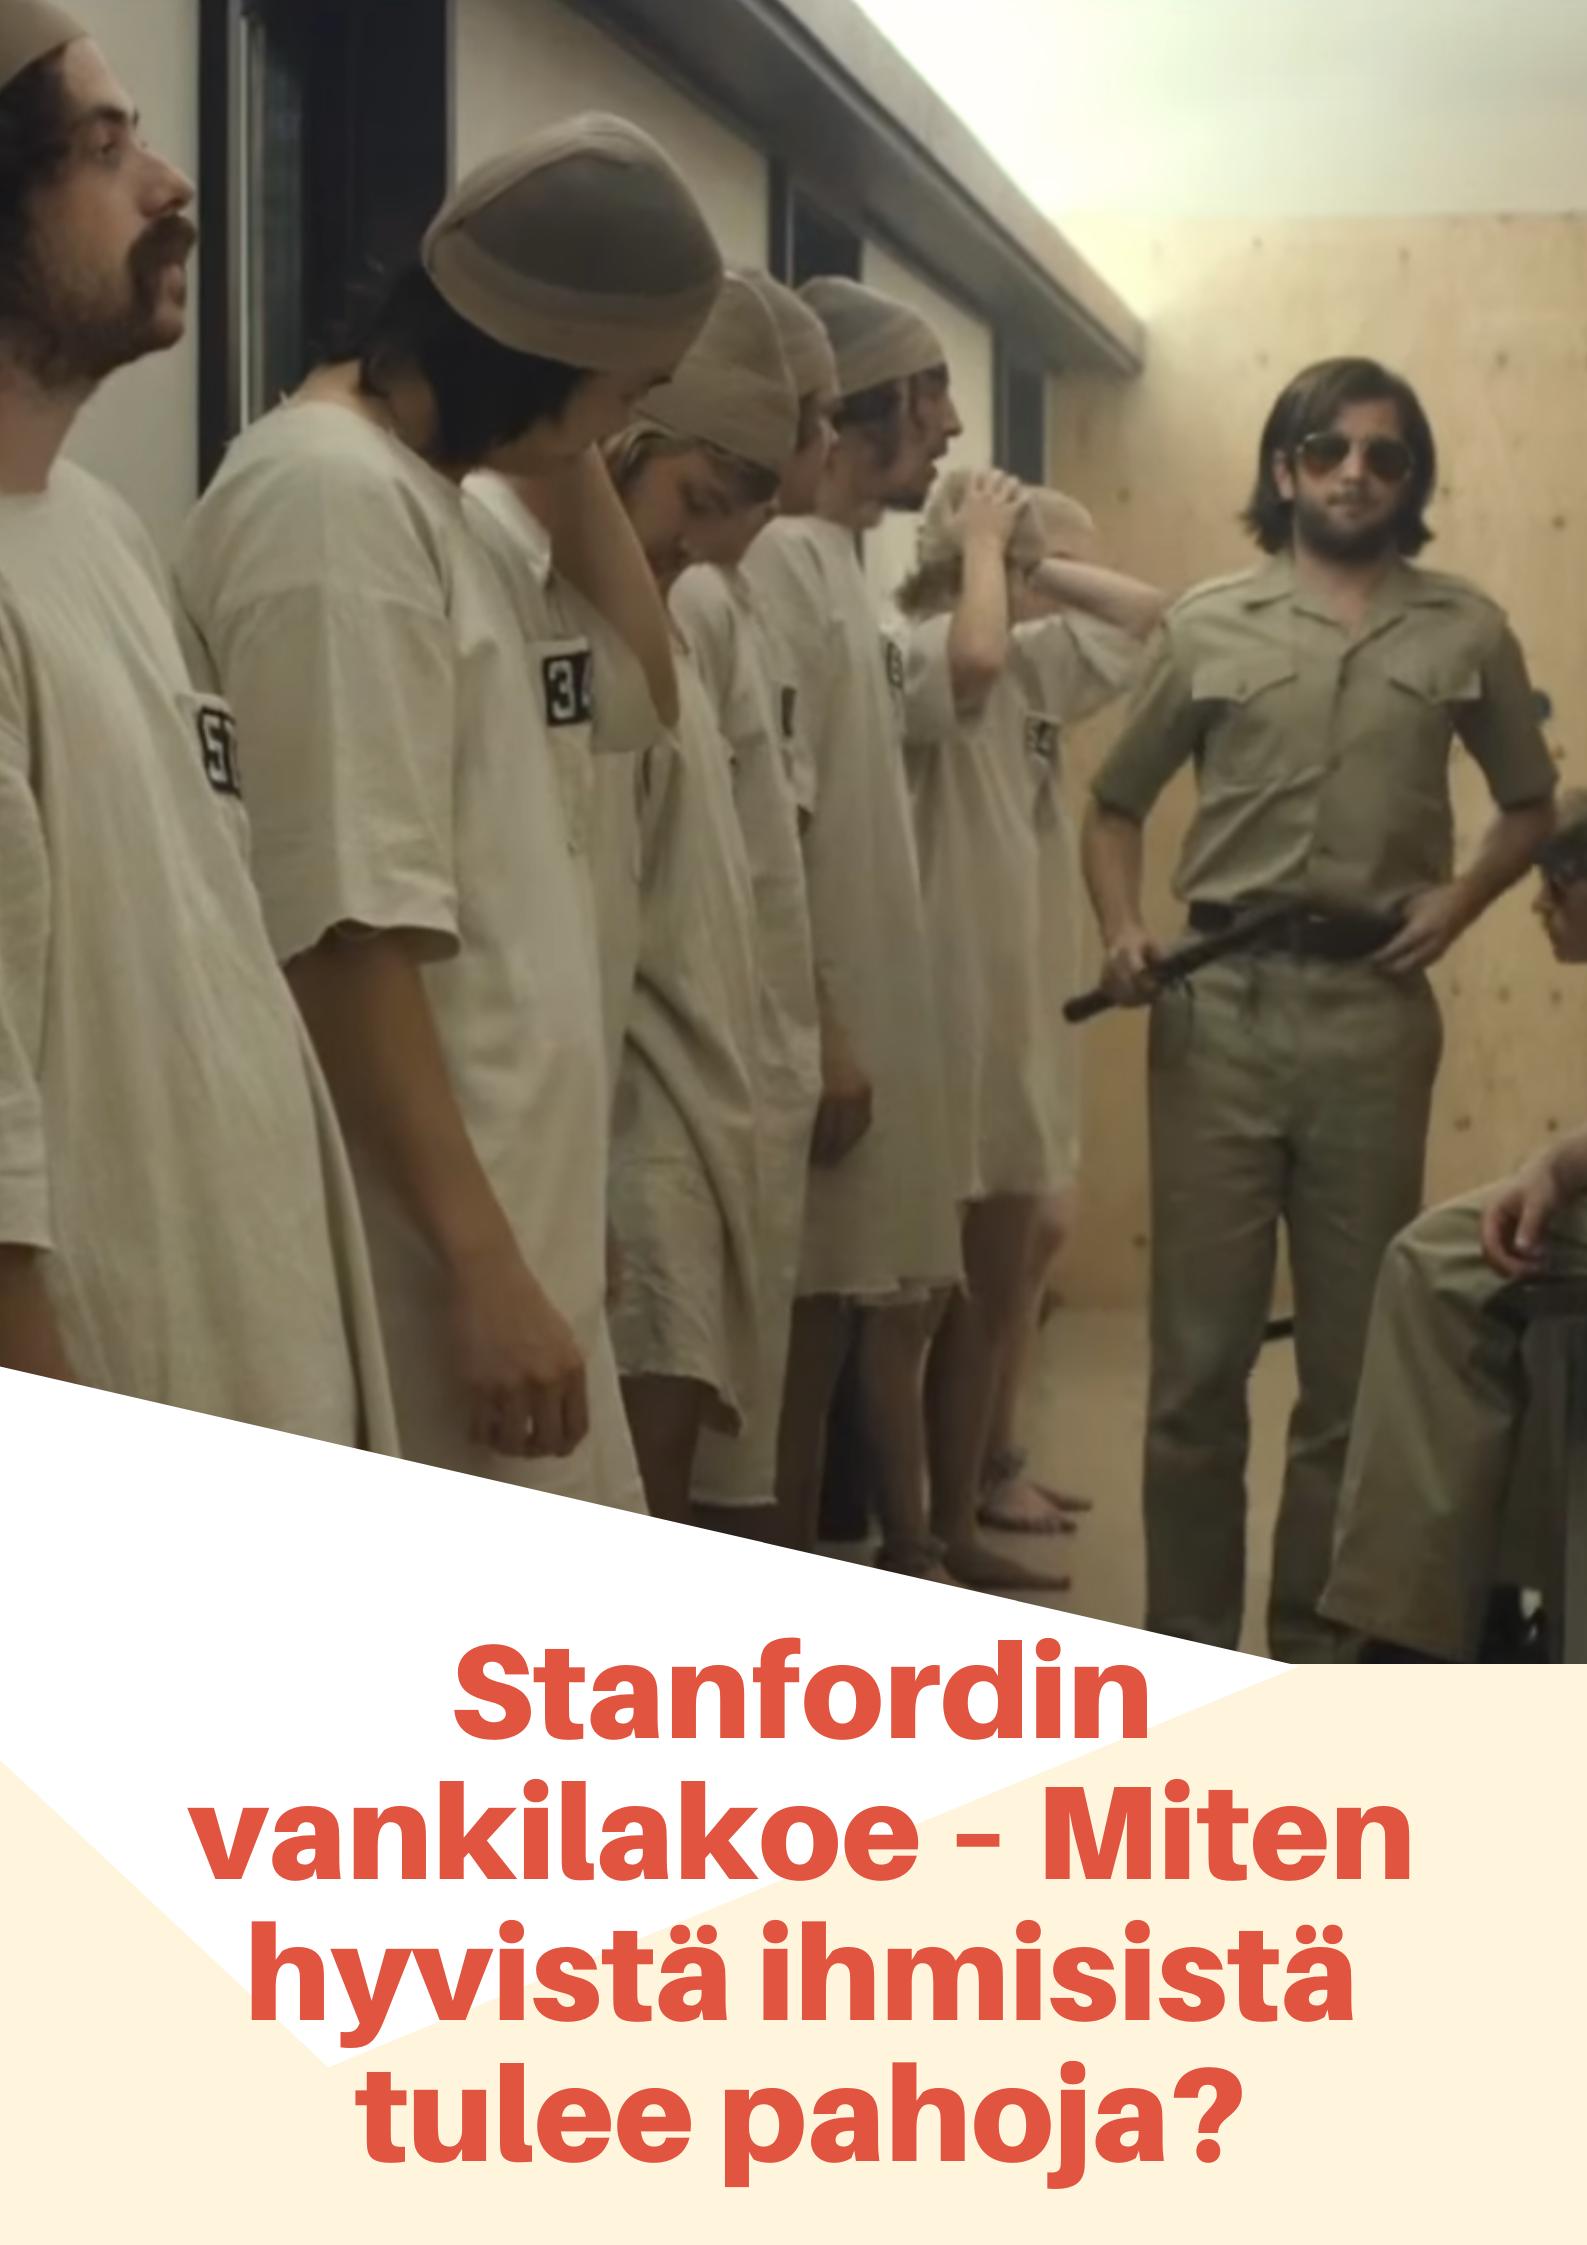 Zimbardon Vankilakoe